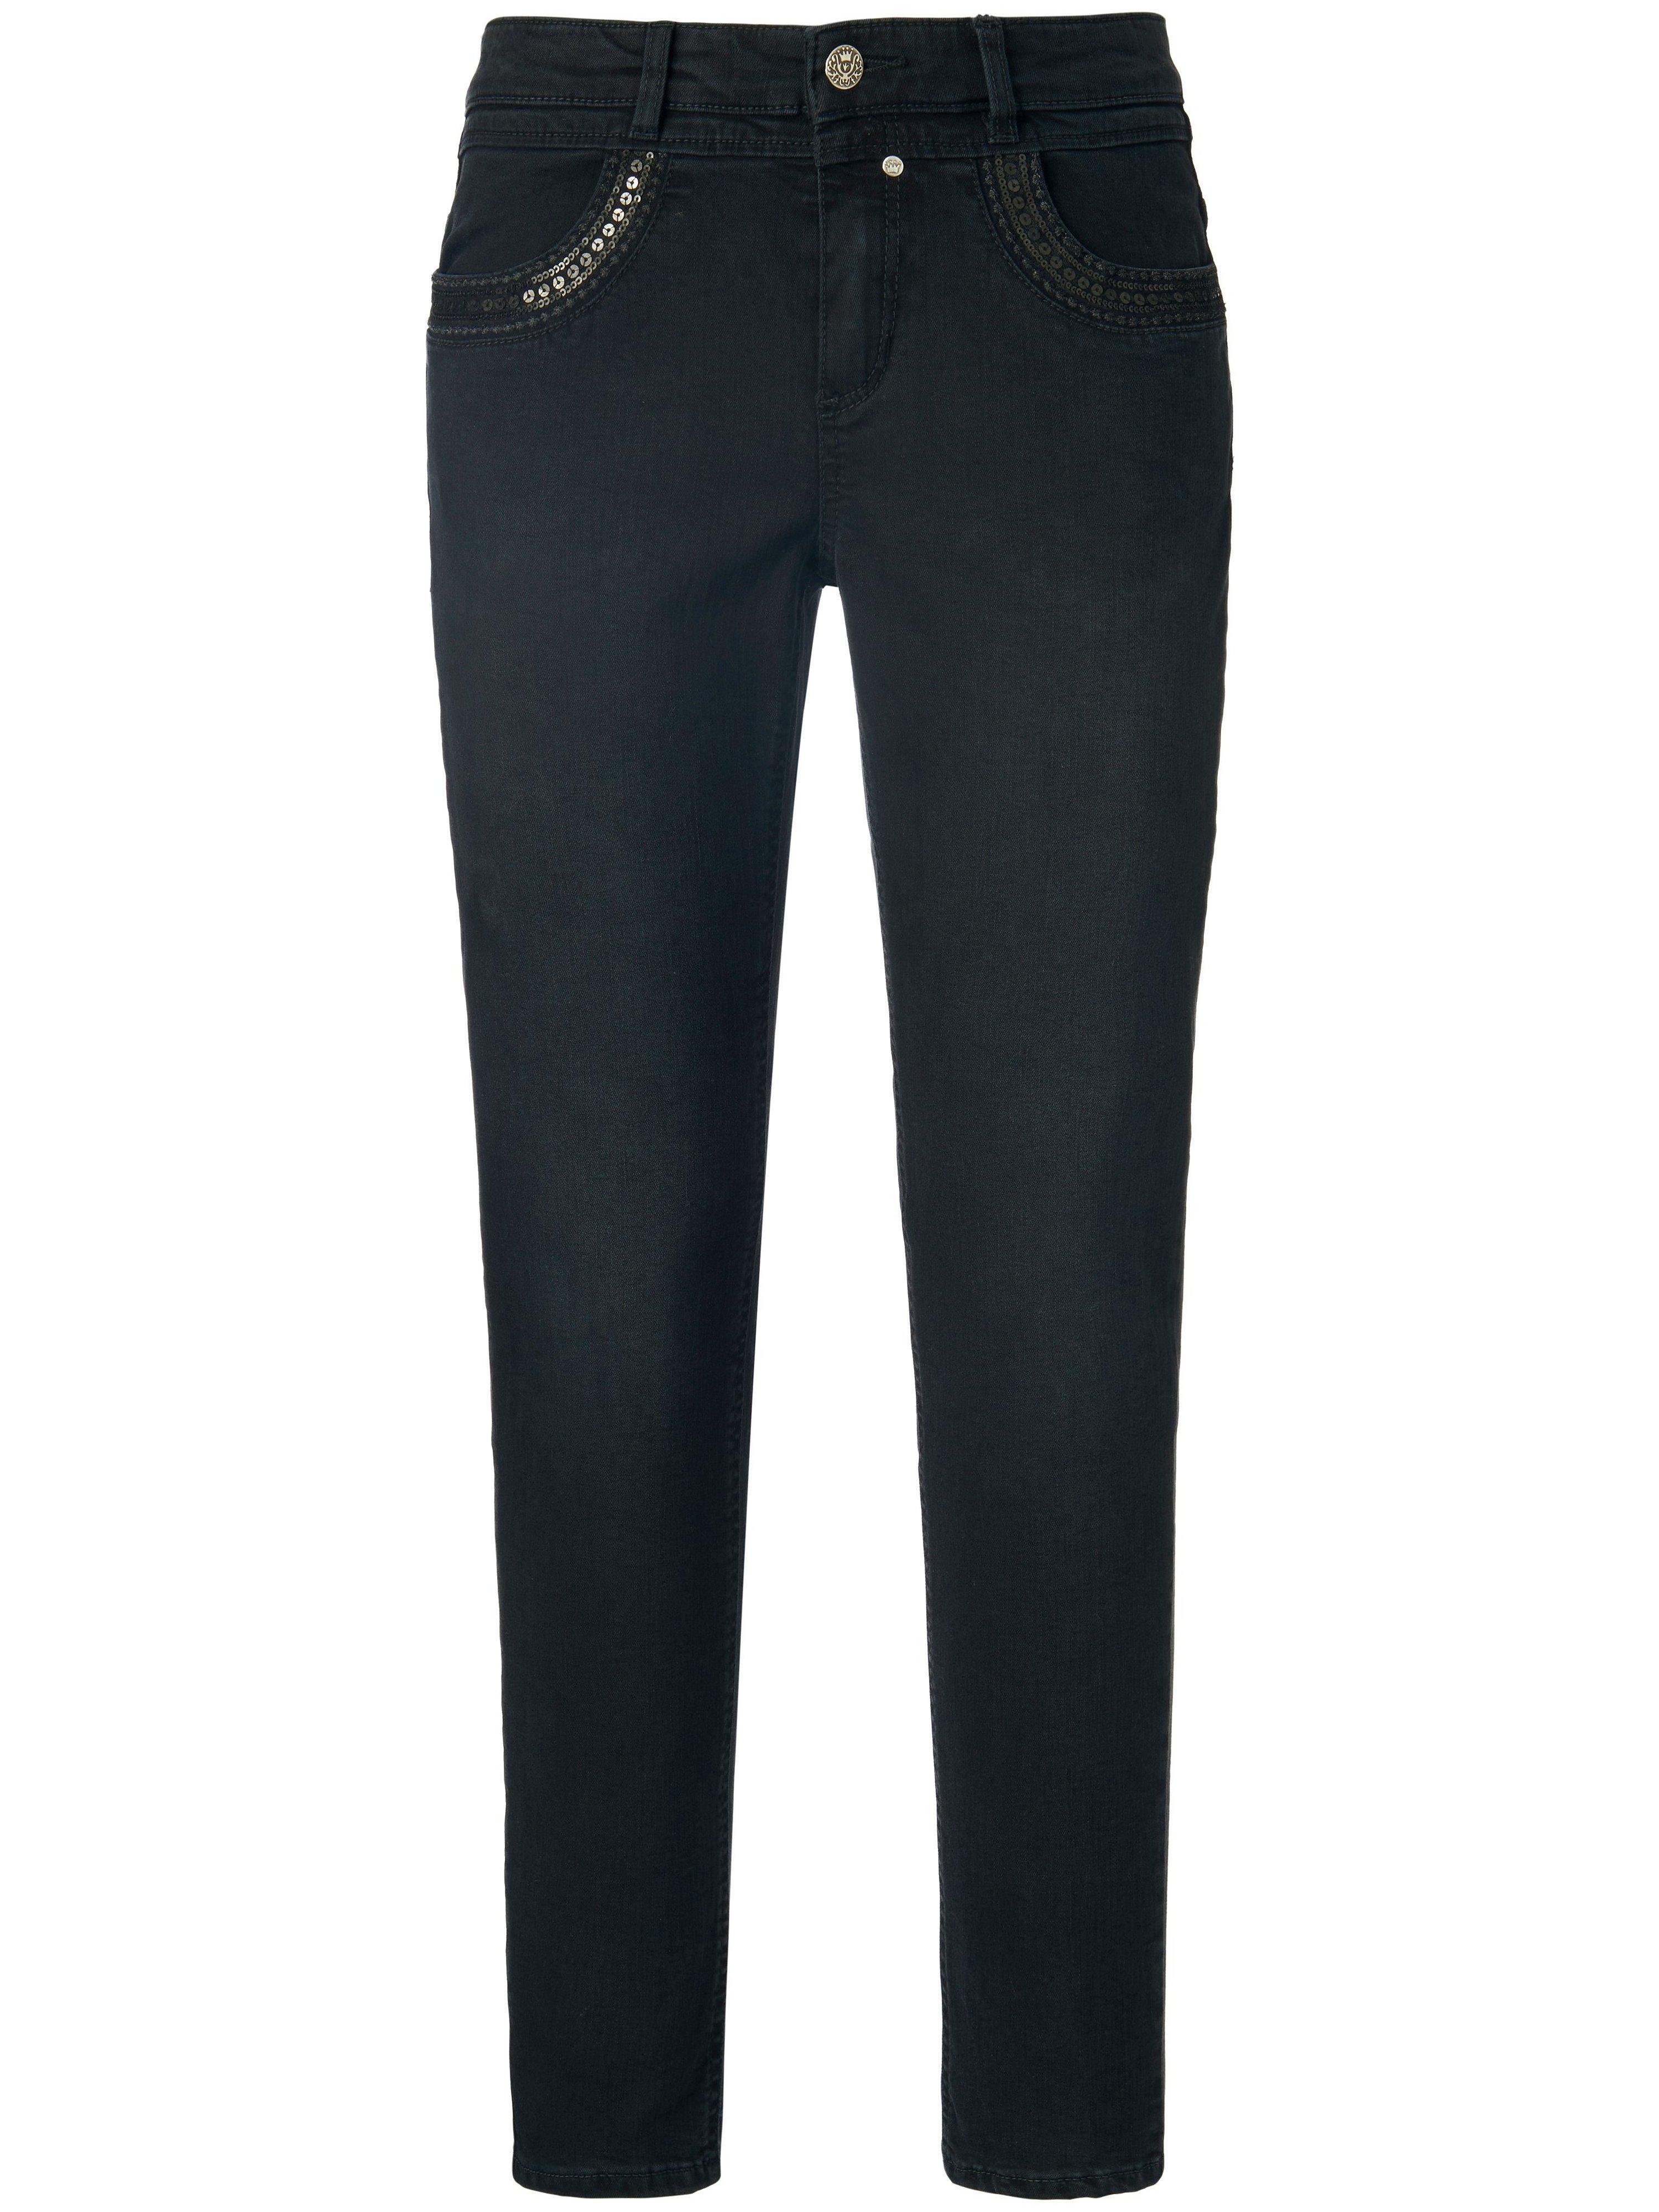 Enkellange jeans model Grace Van Glücksmoment denim